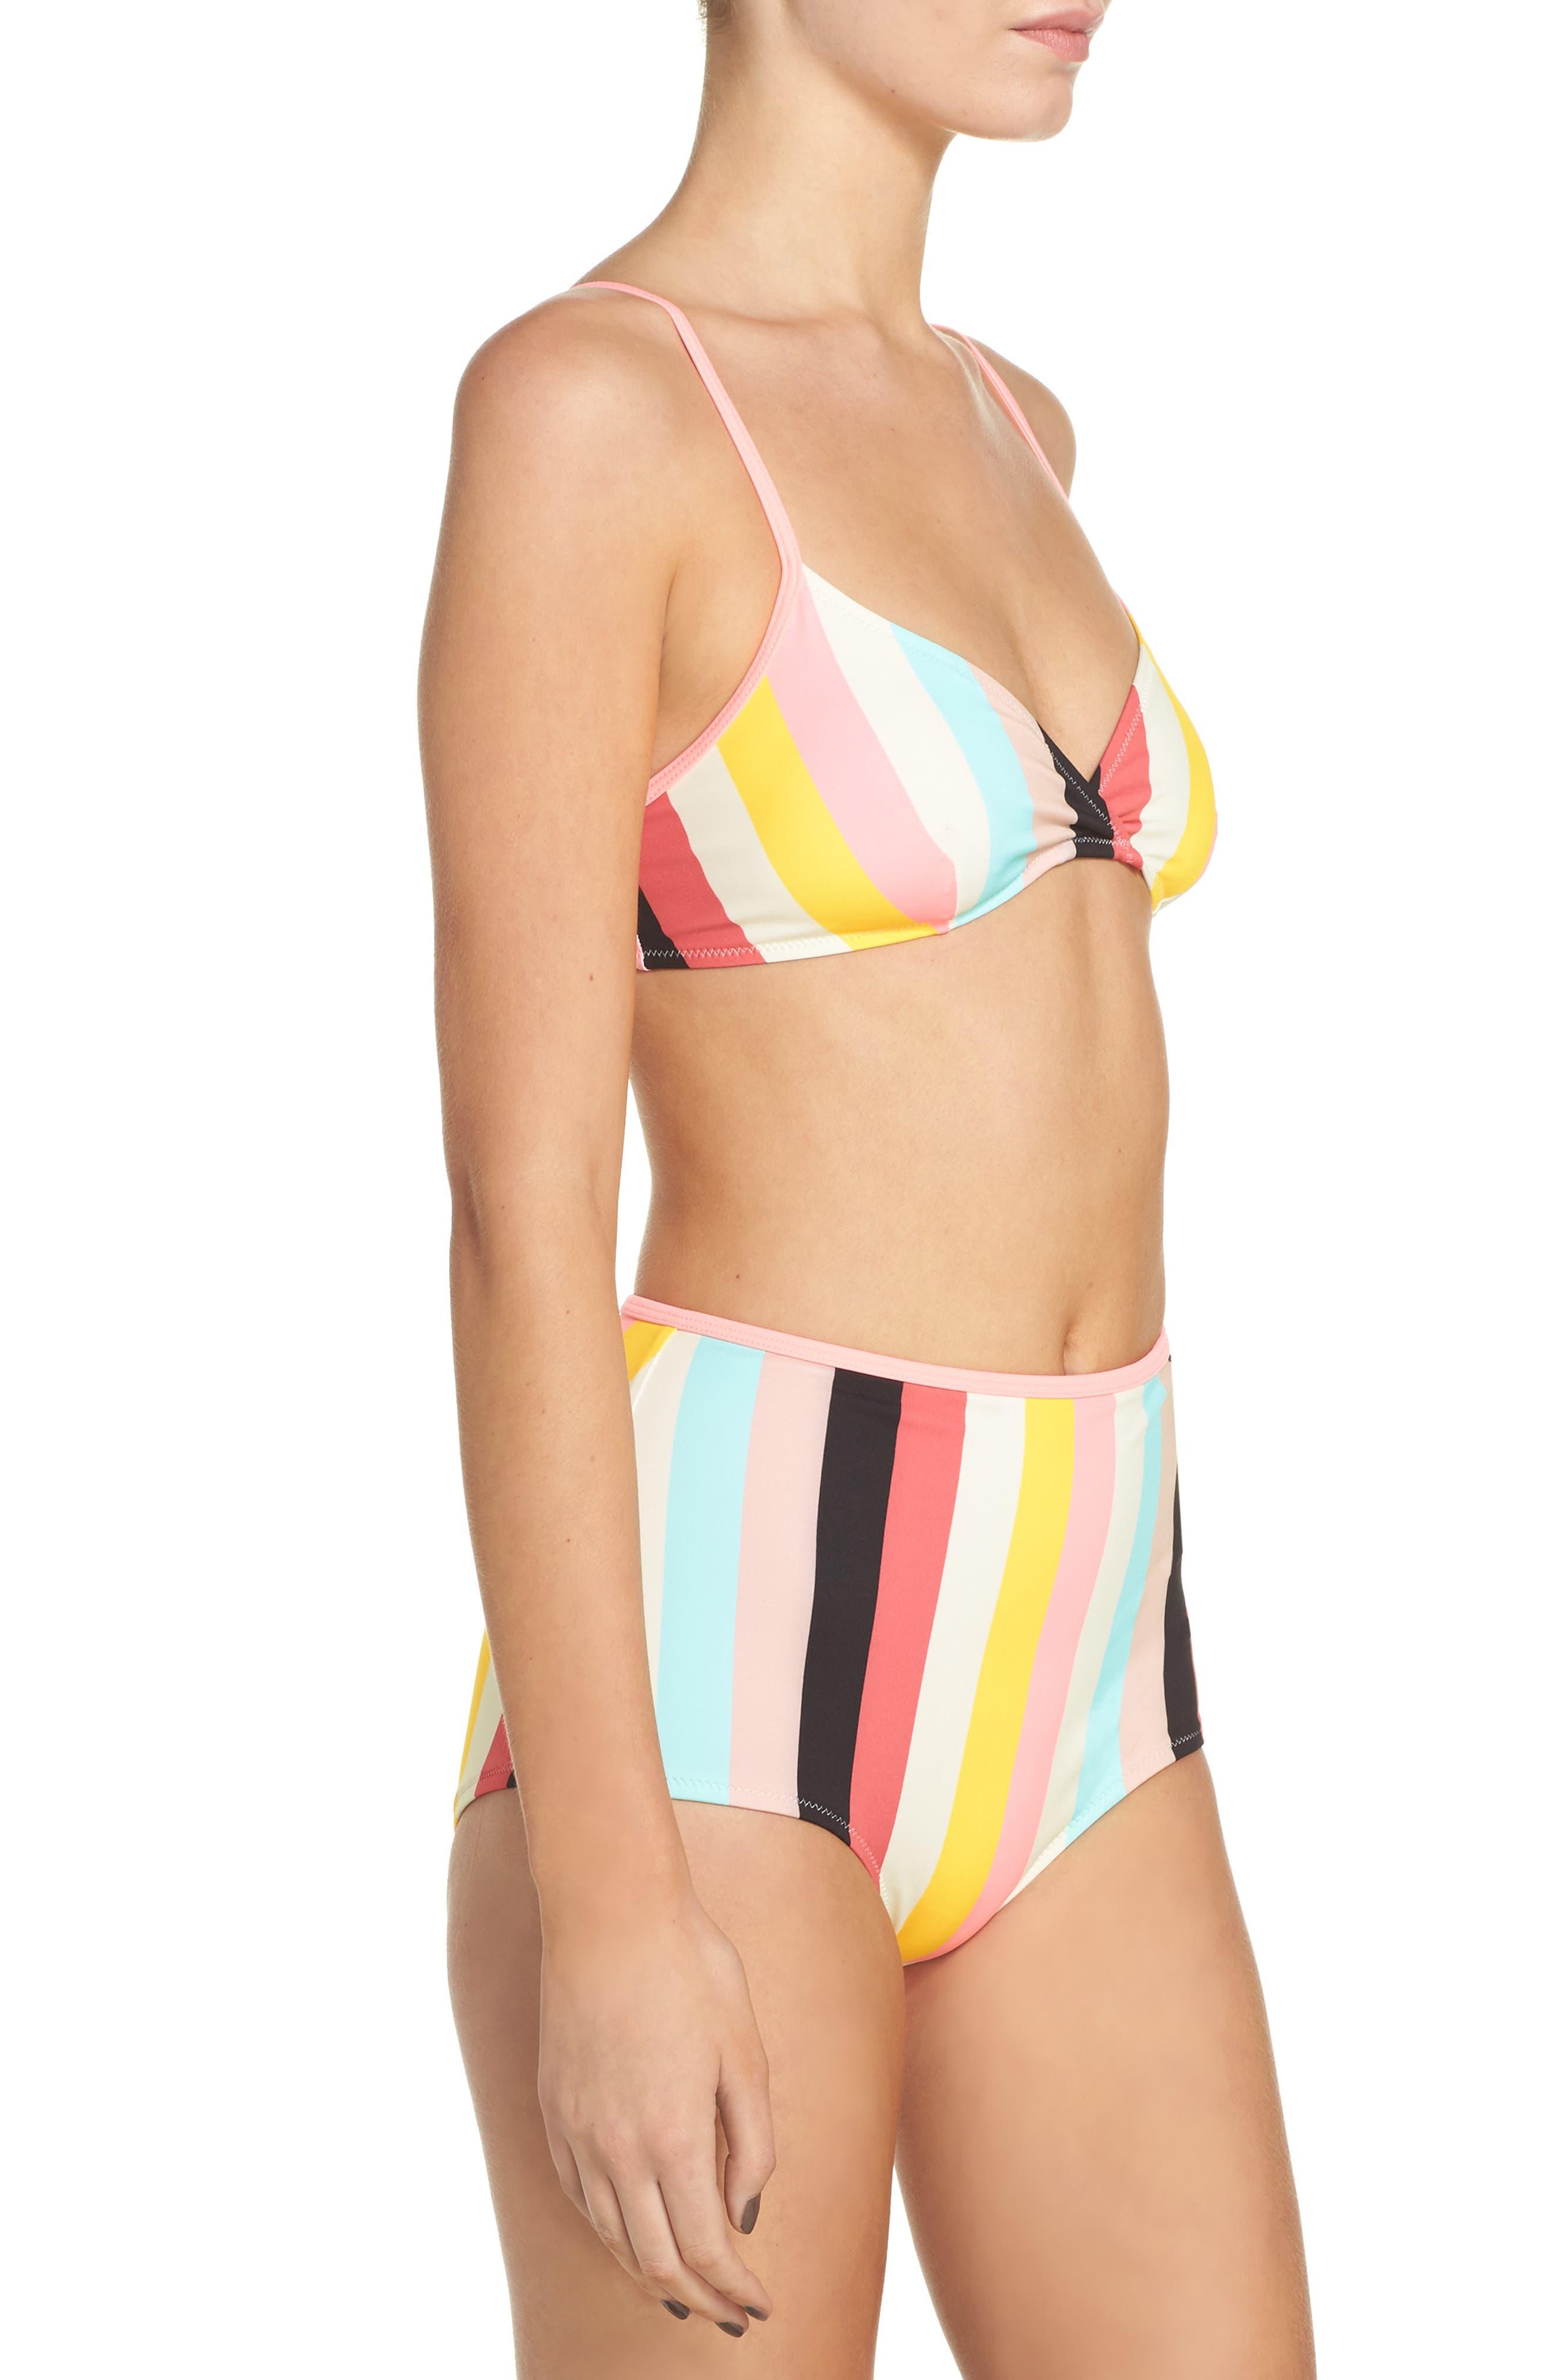 Brigitte Bikini Top,                             Alternate thumbnail 8, color,                             650